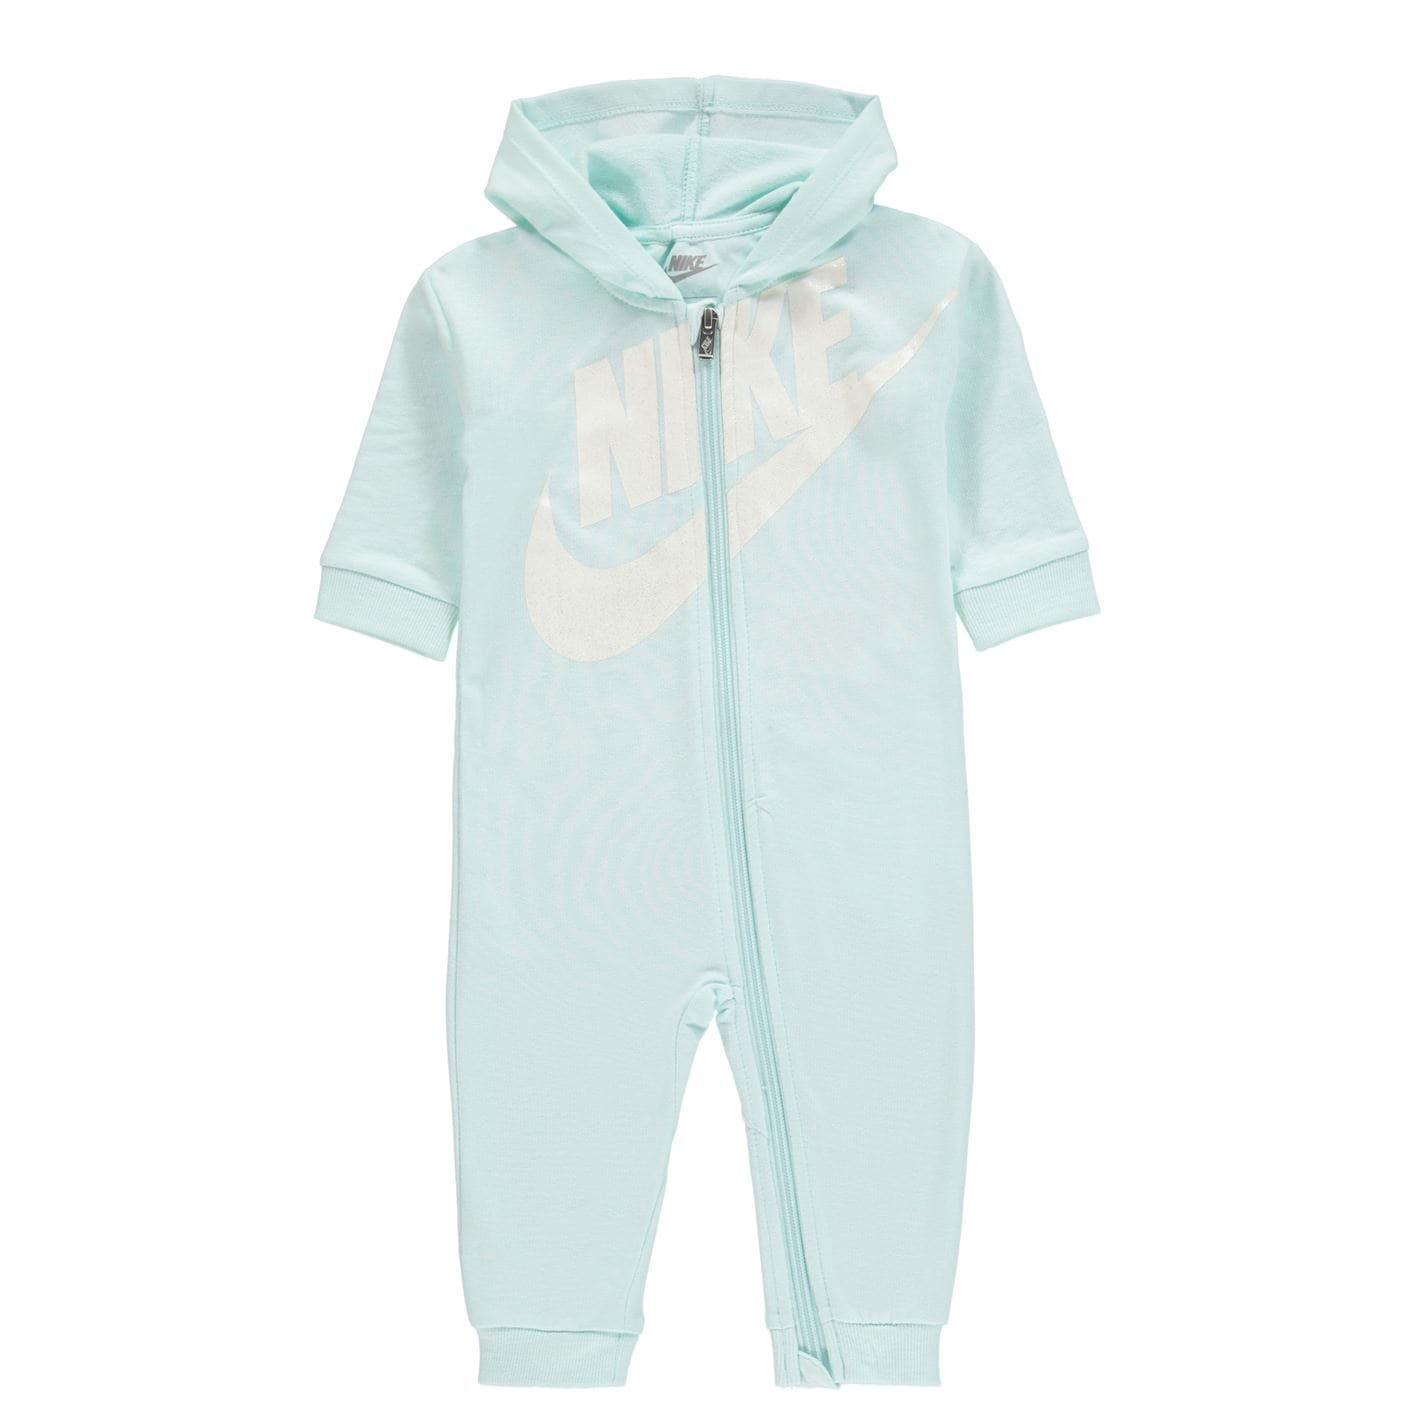 Mergi la Salopeta Nike Swoosh pentru fete pentru Bebelusi bleu tint